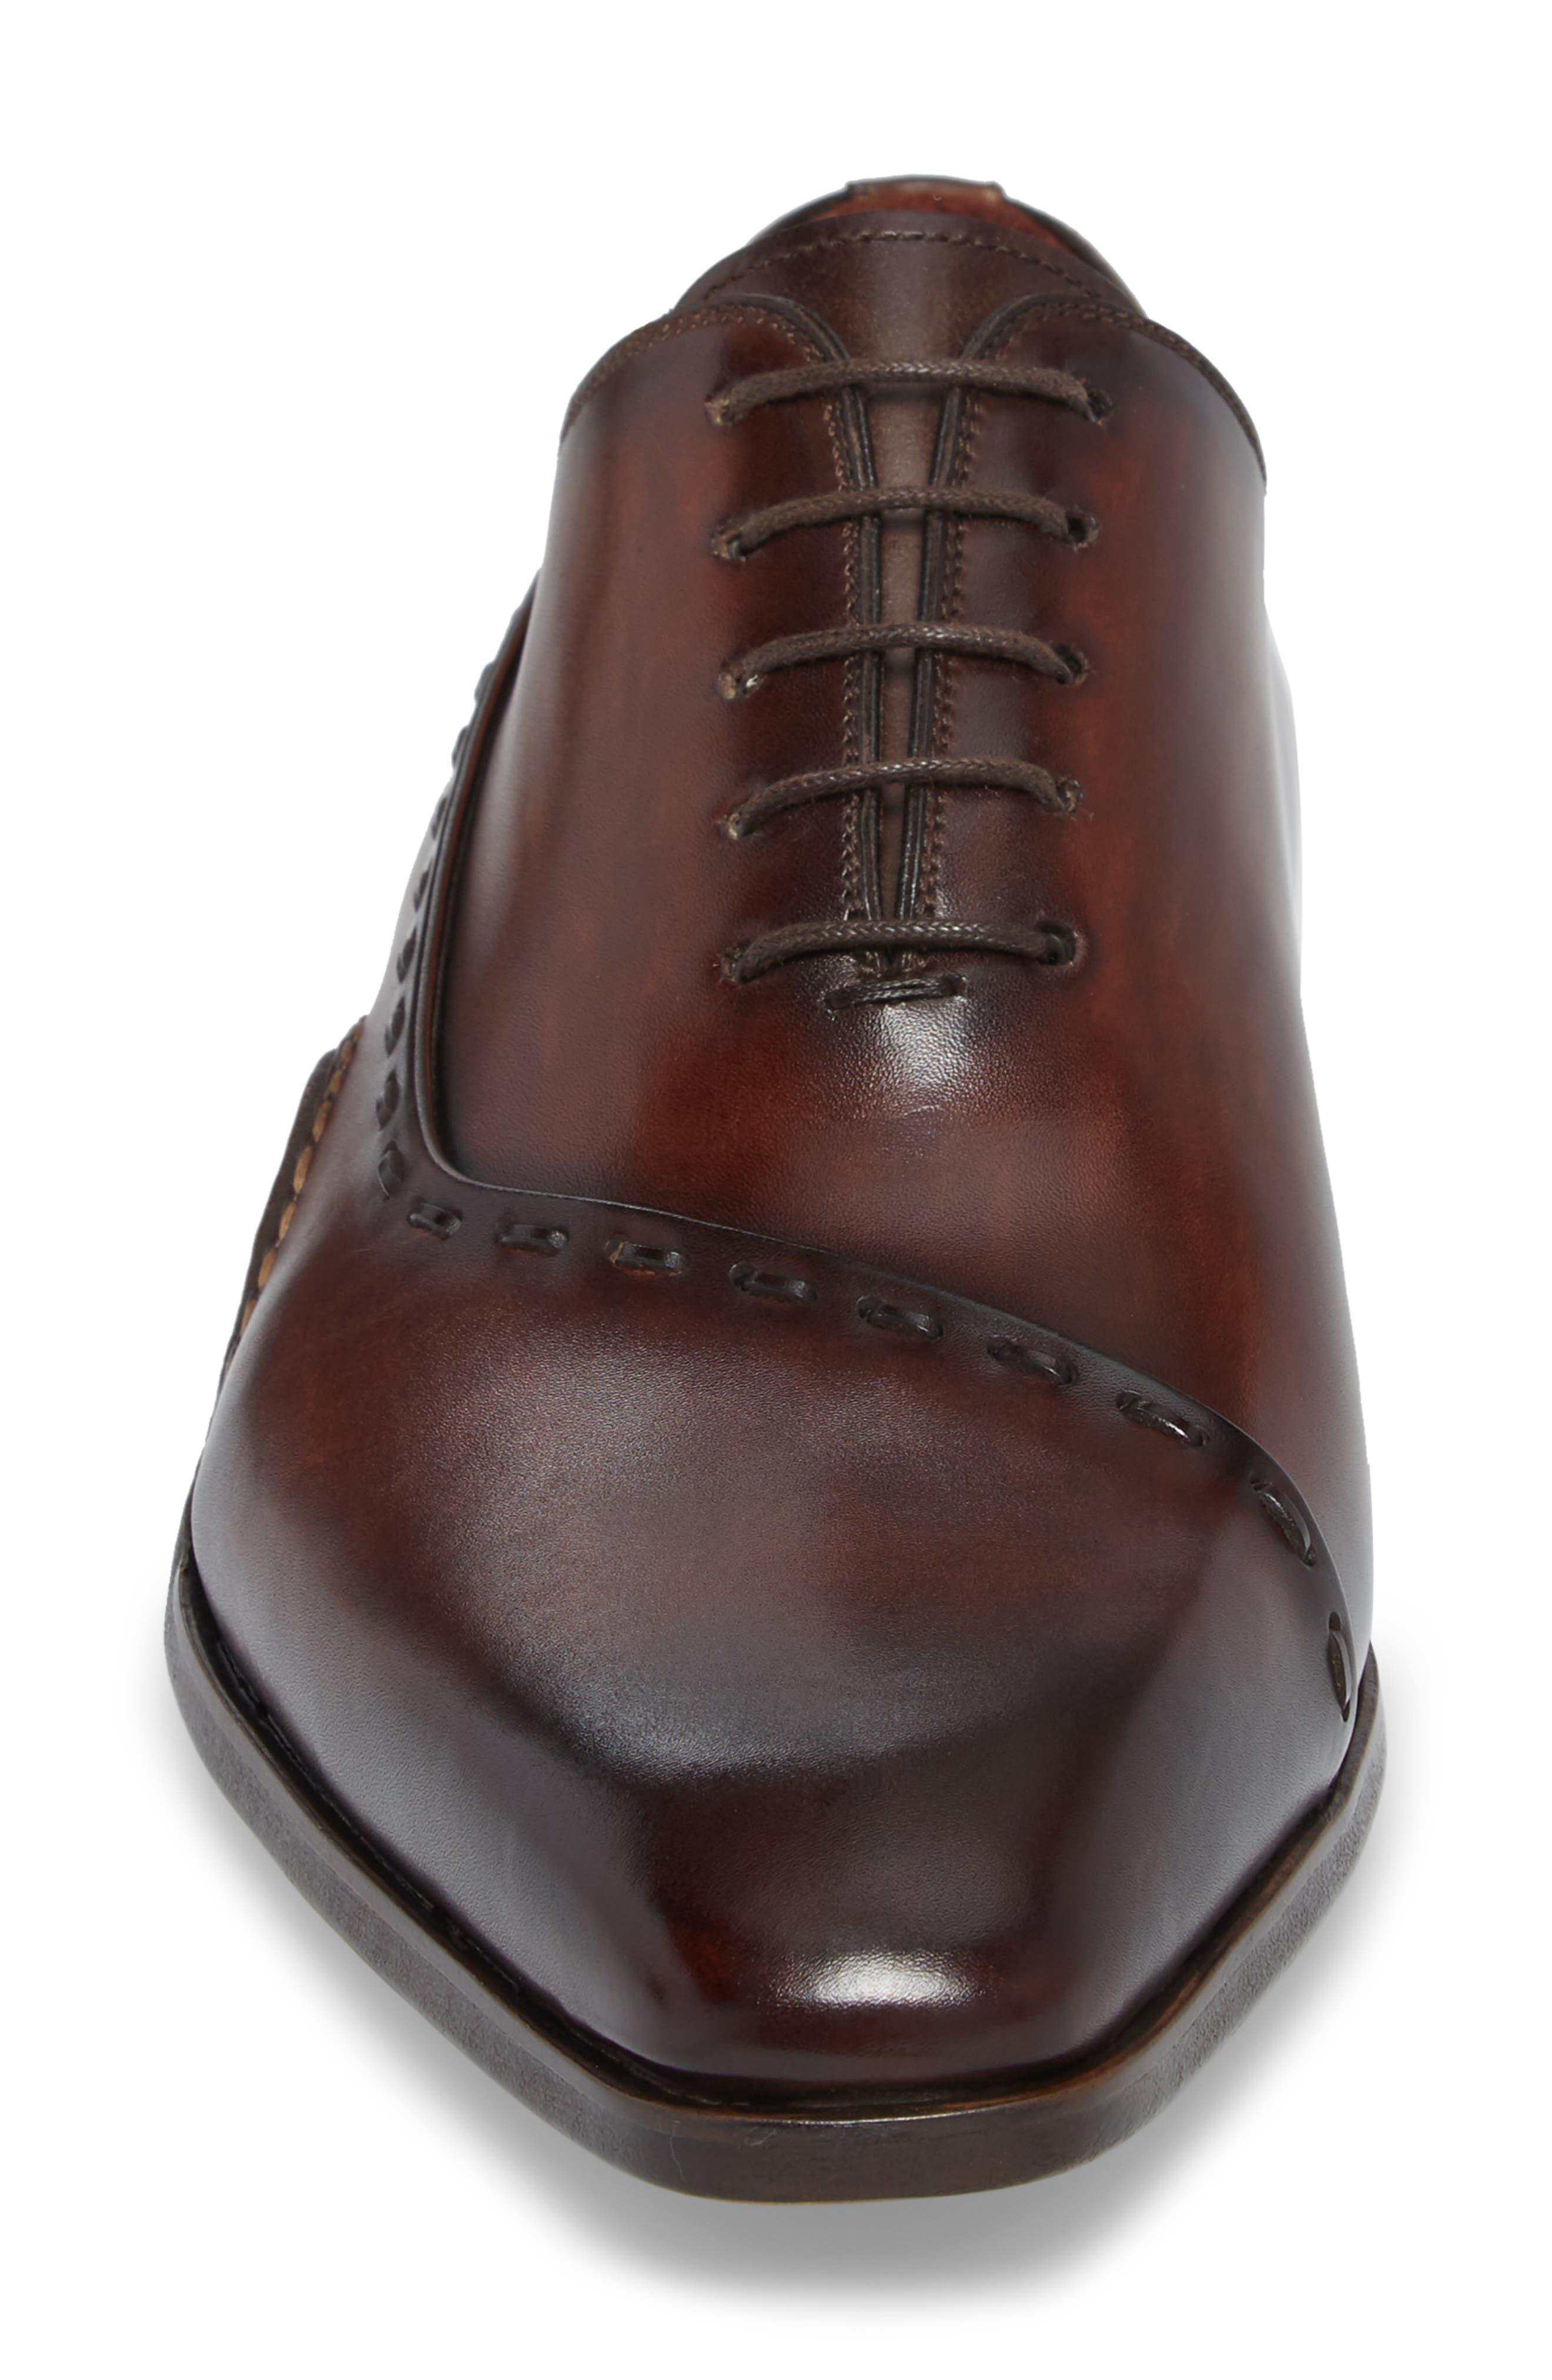 Kobe Asymmetrical Whole Cut Shoe,                             Alternate thumbnail 4, color,                             Mid-Brown Leather